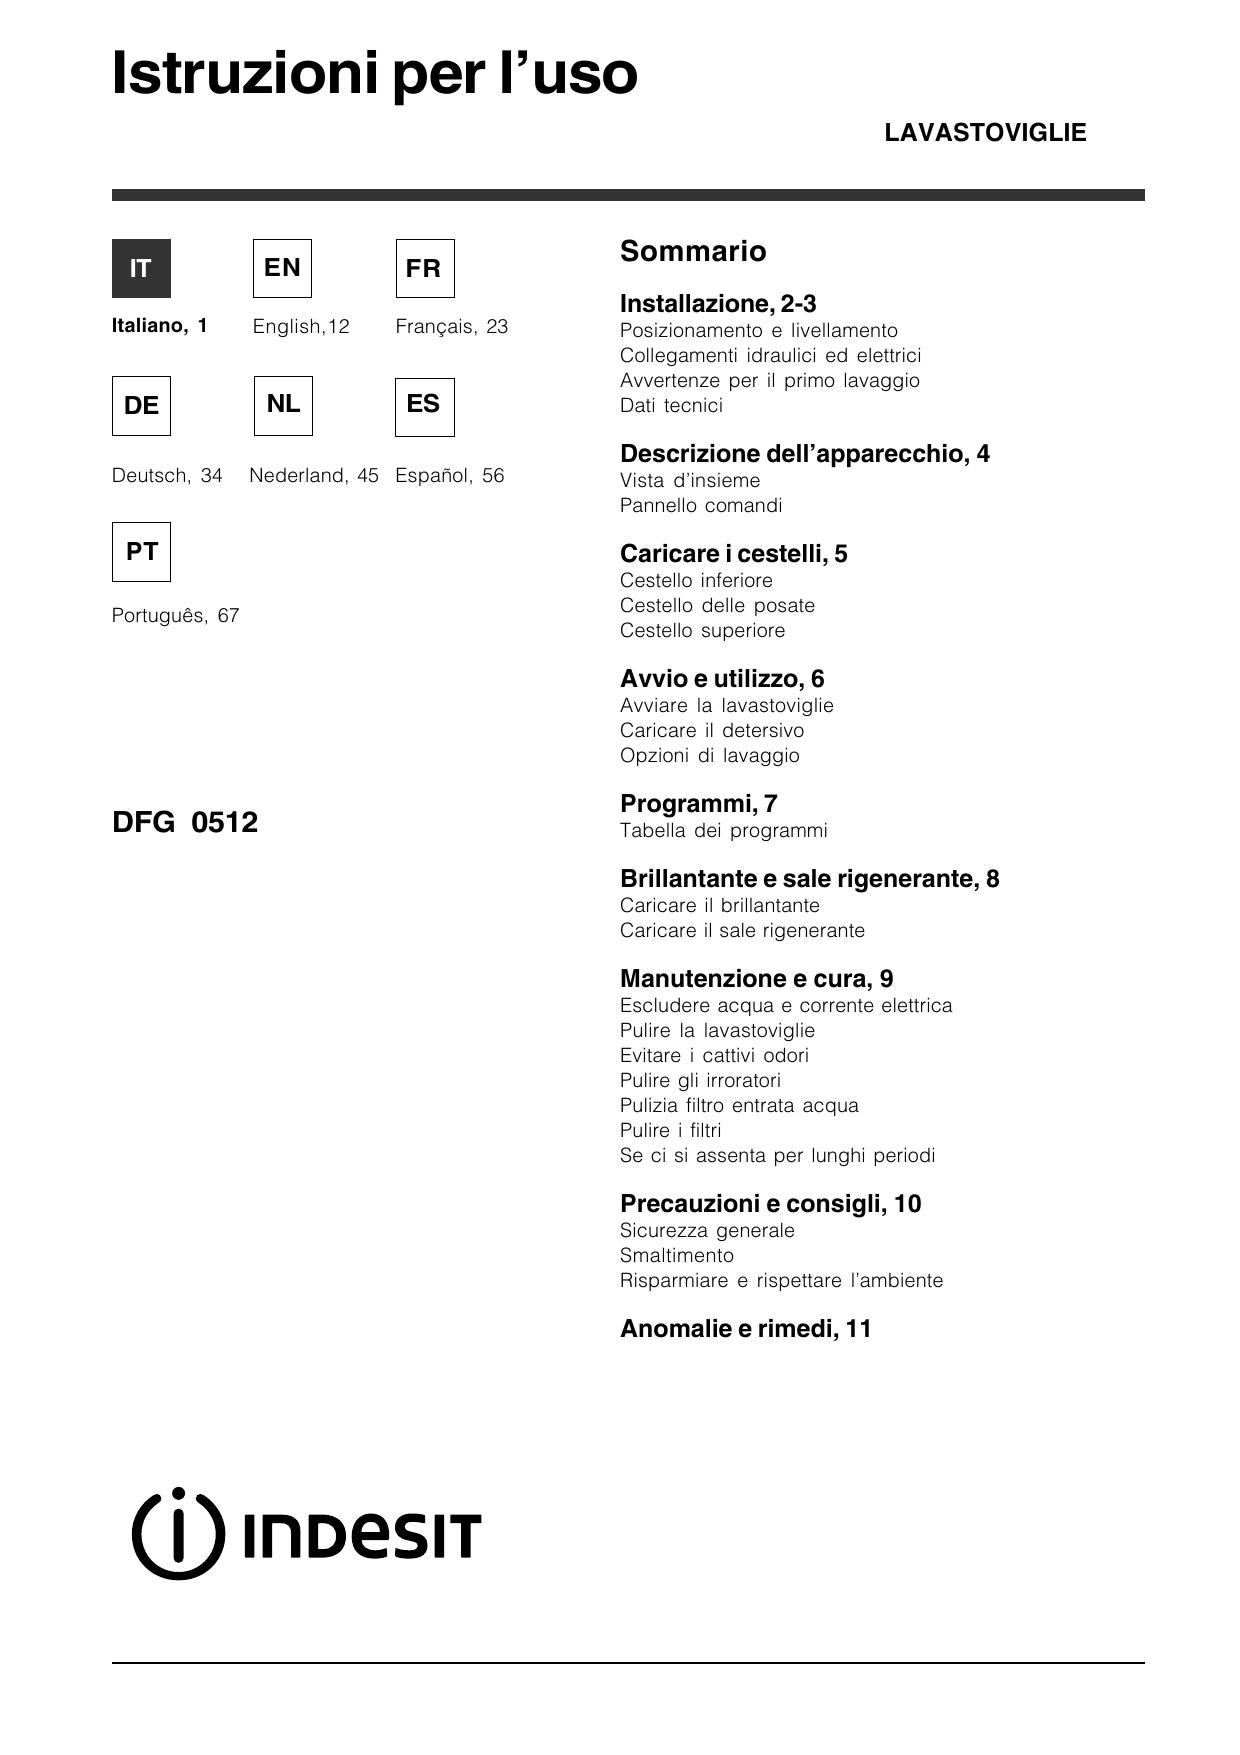 Perchè Acero Rosso Diventa Verde indesit dfg 0512 eu instruction for use | manualzz